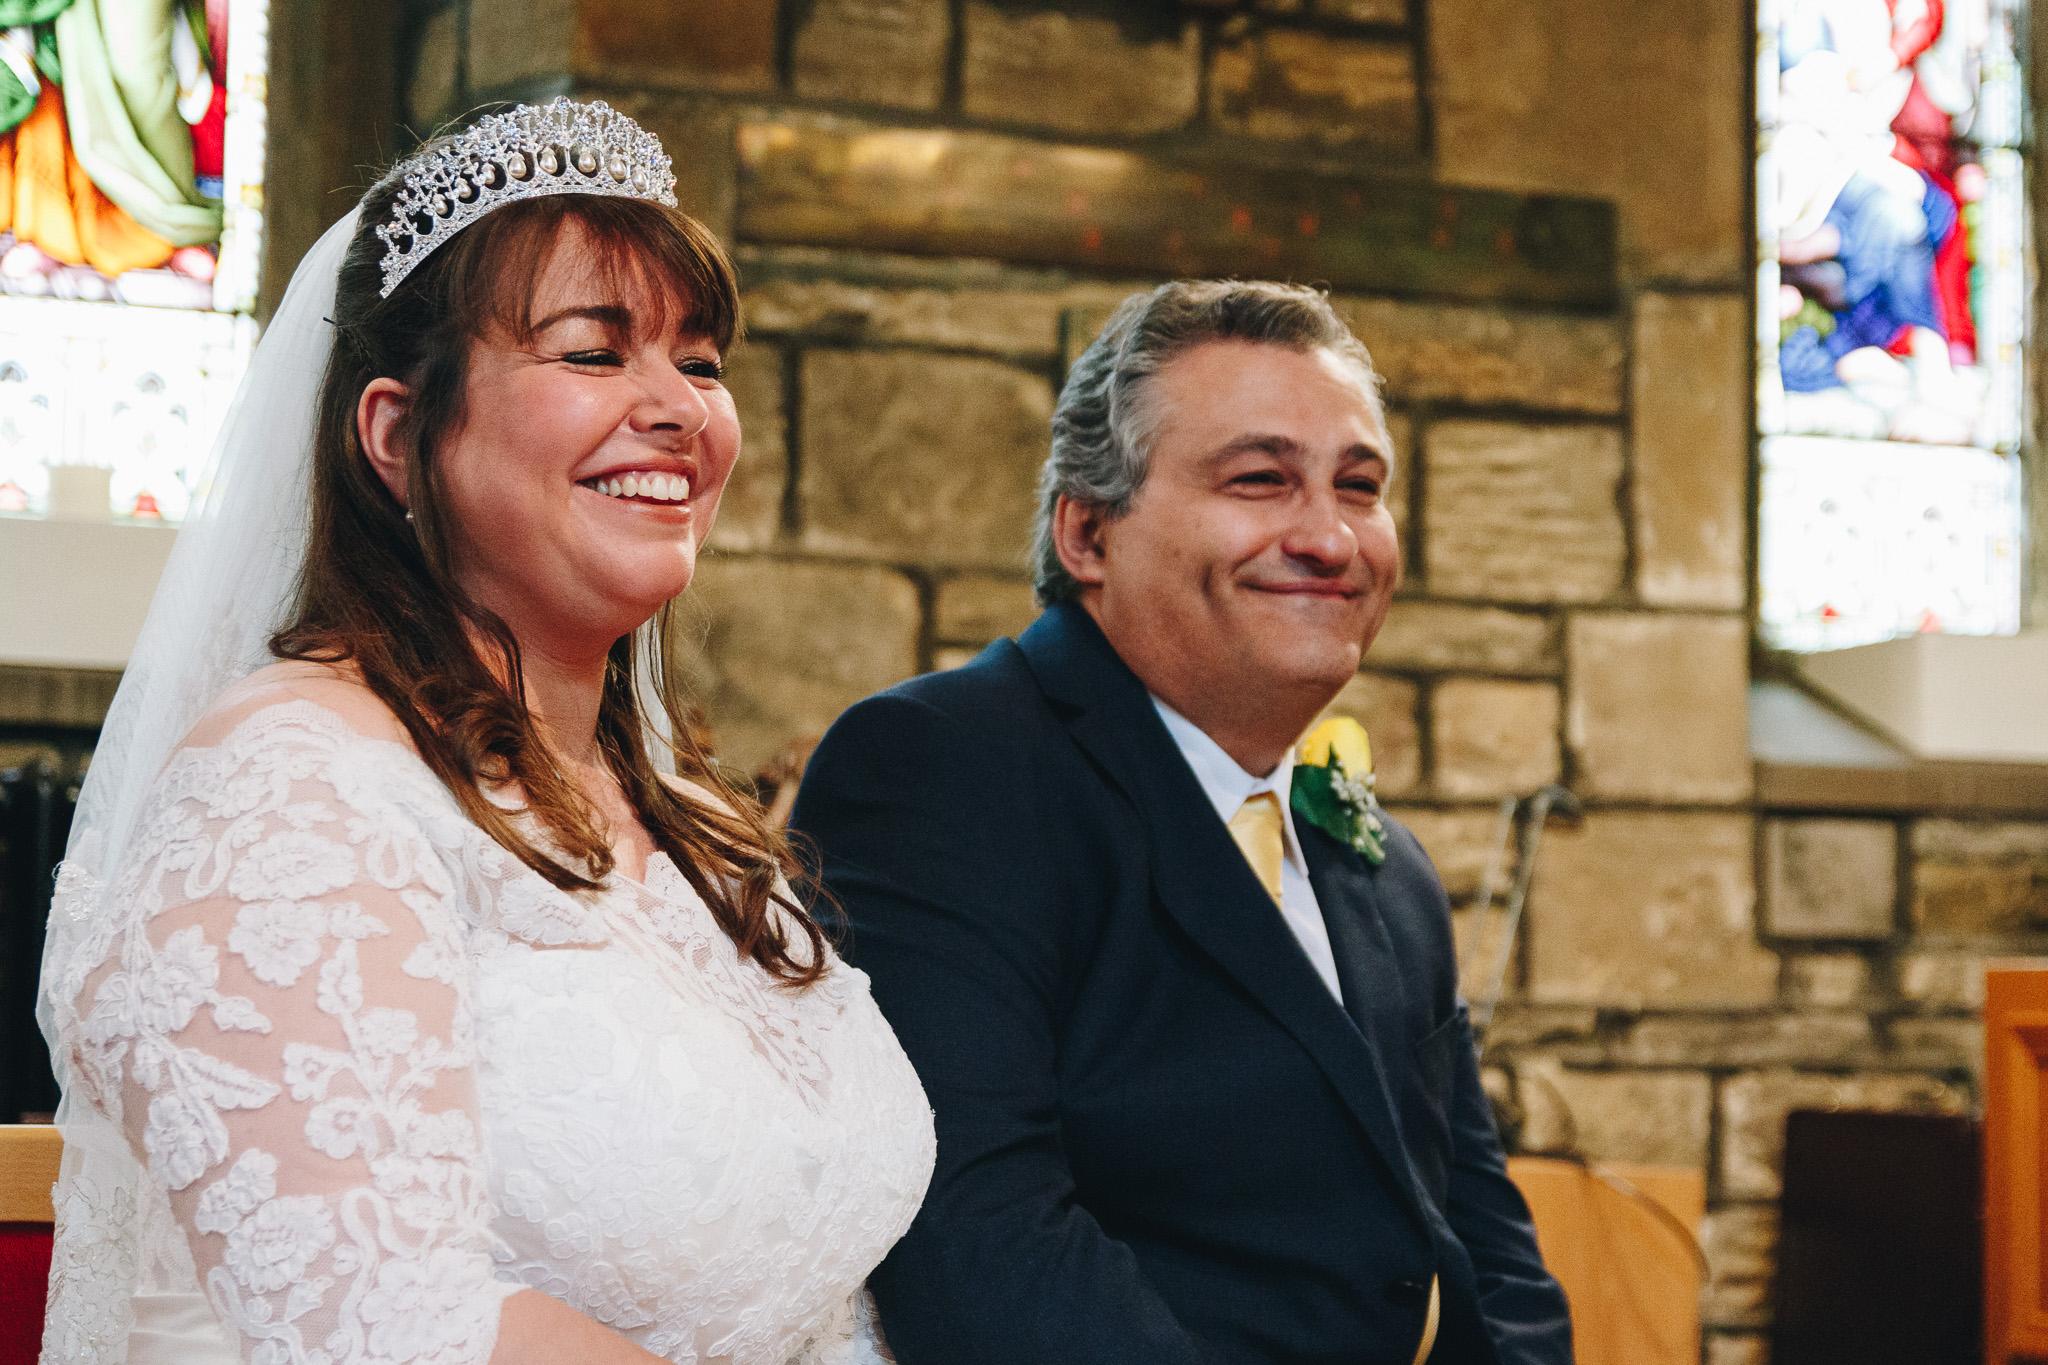 Nat and Sergio Wedding Photos - Website Quality_075.jpg